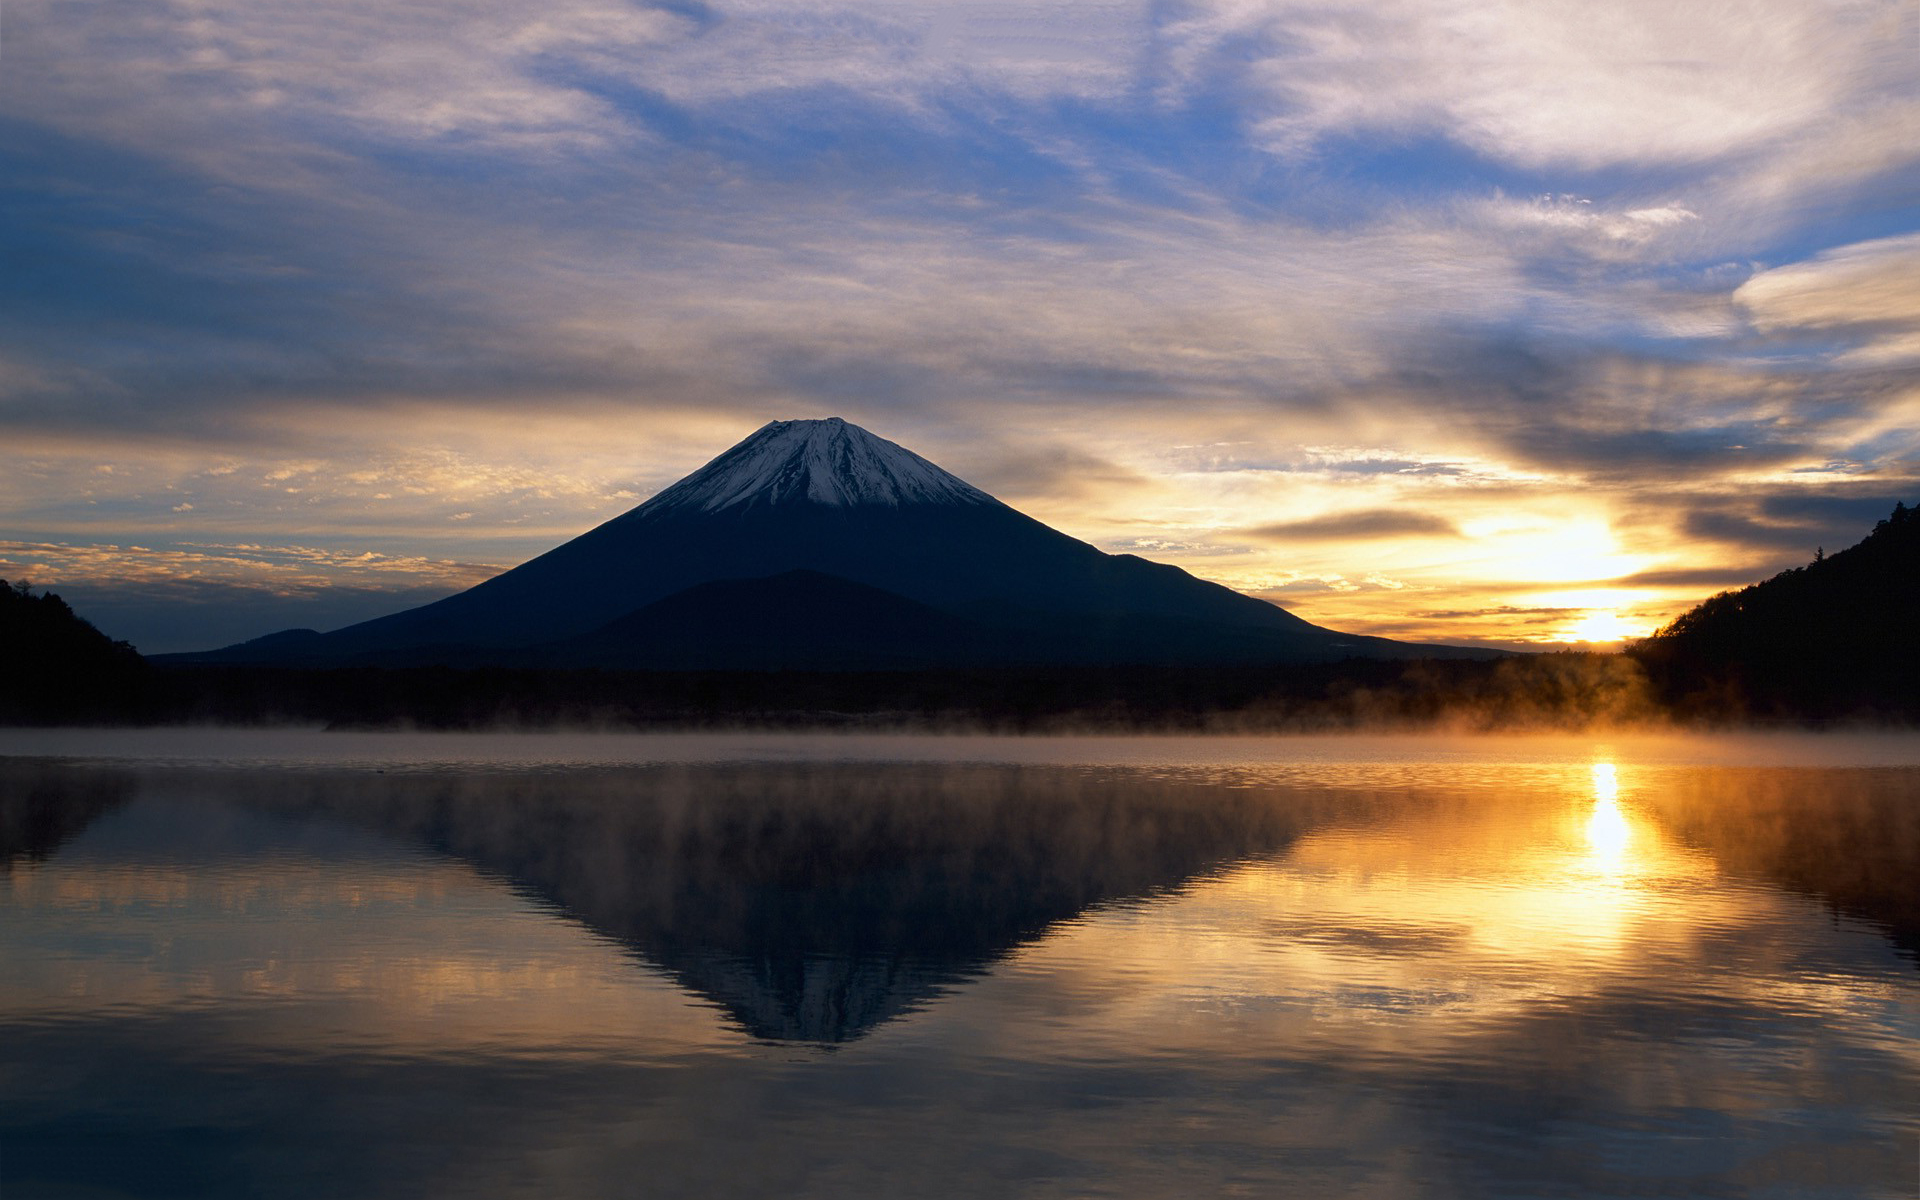 3d Cherry Blossom Wallpaper 15 Hd Mount Fuji Japan Wallpapers Hdwallsource Com